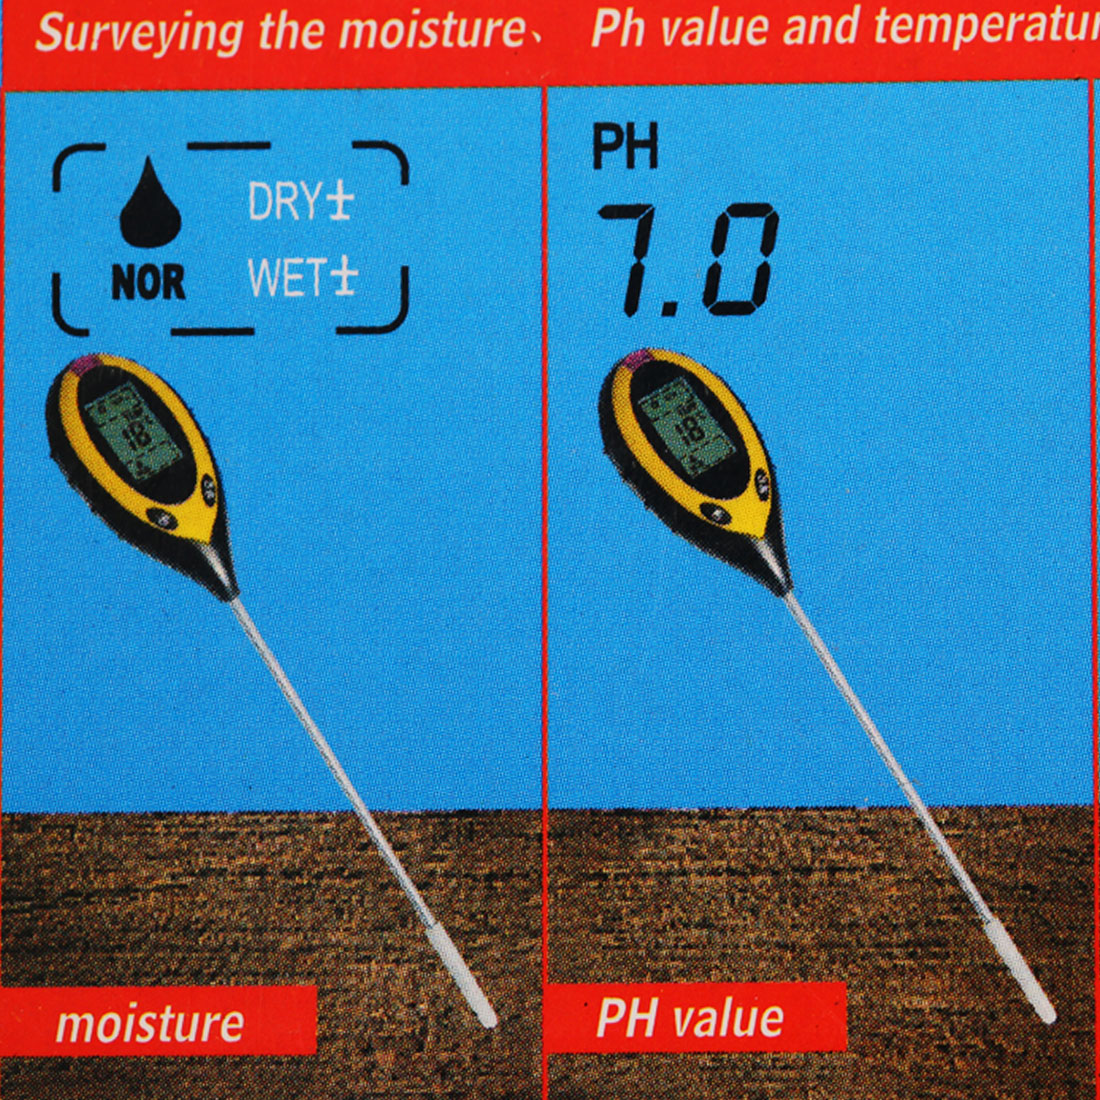 New 4 in 1 Plant Soil PH Moisture Light Soil Meter Thermometer Soil Survey Instrument PH Value Sunlight Tester Hot Wholesale mc 7806 digital moisture analyzer price with pin type cotton paper building tobacco moisture meter